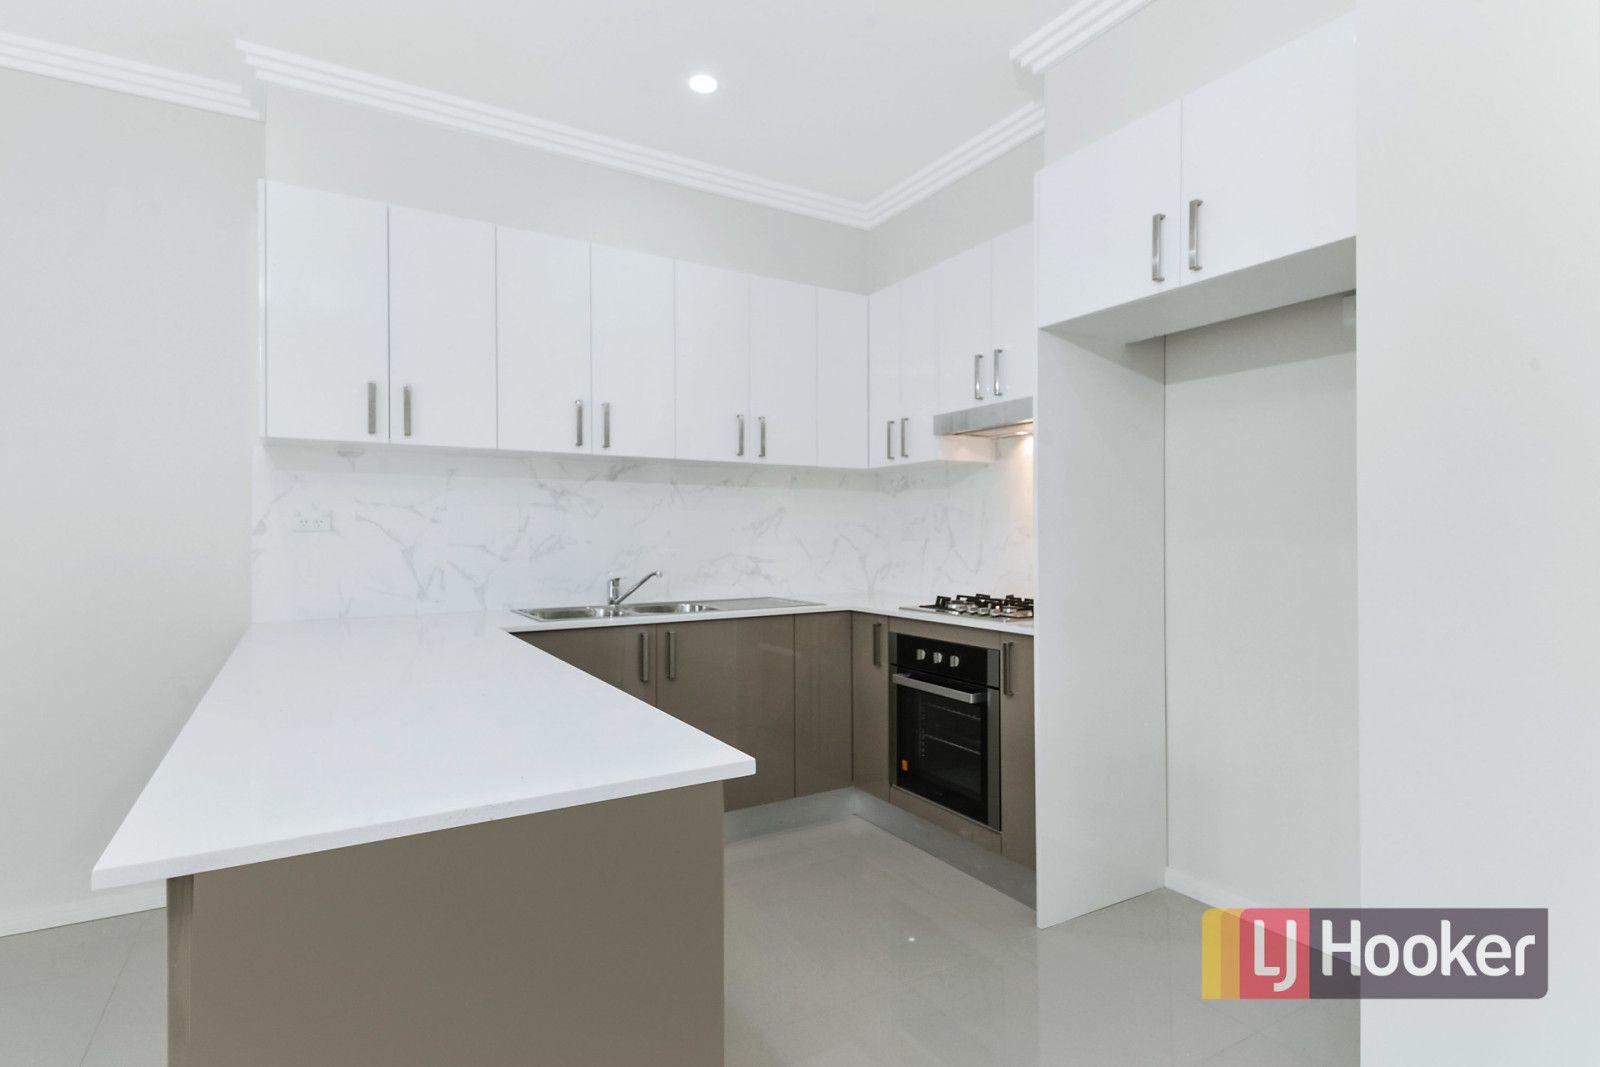 2/48 Mountford Ave, Guildford NSW 2161, Image 1